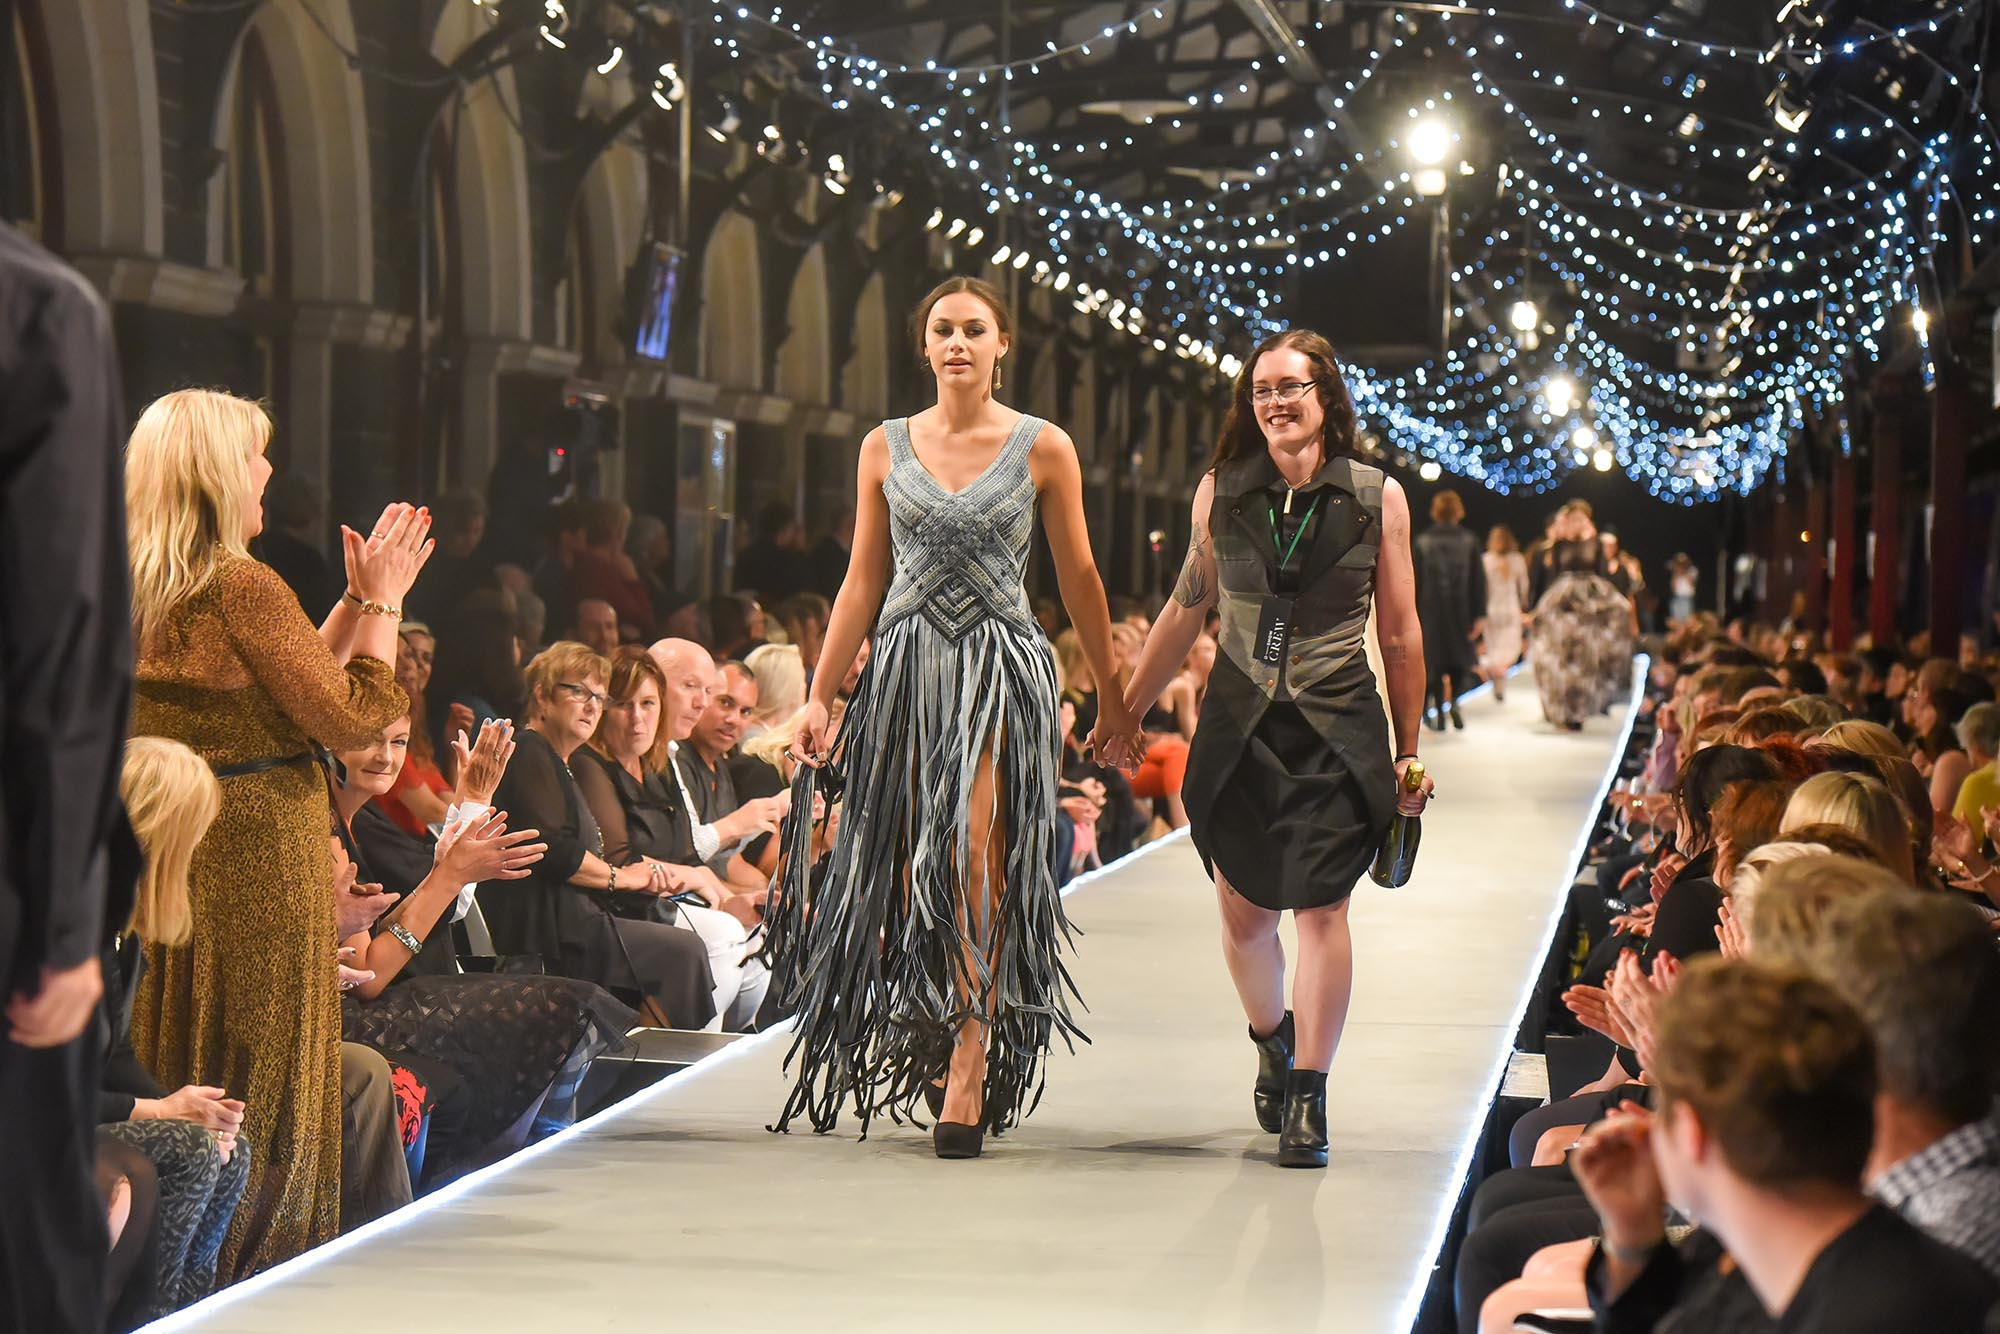 iD2016 - iD Dunedin Fashion Show - Saturday Finale_0020